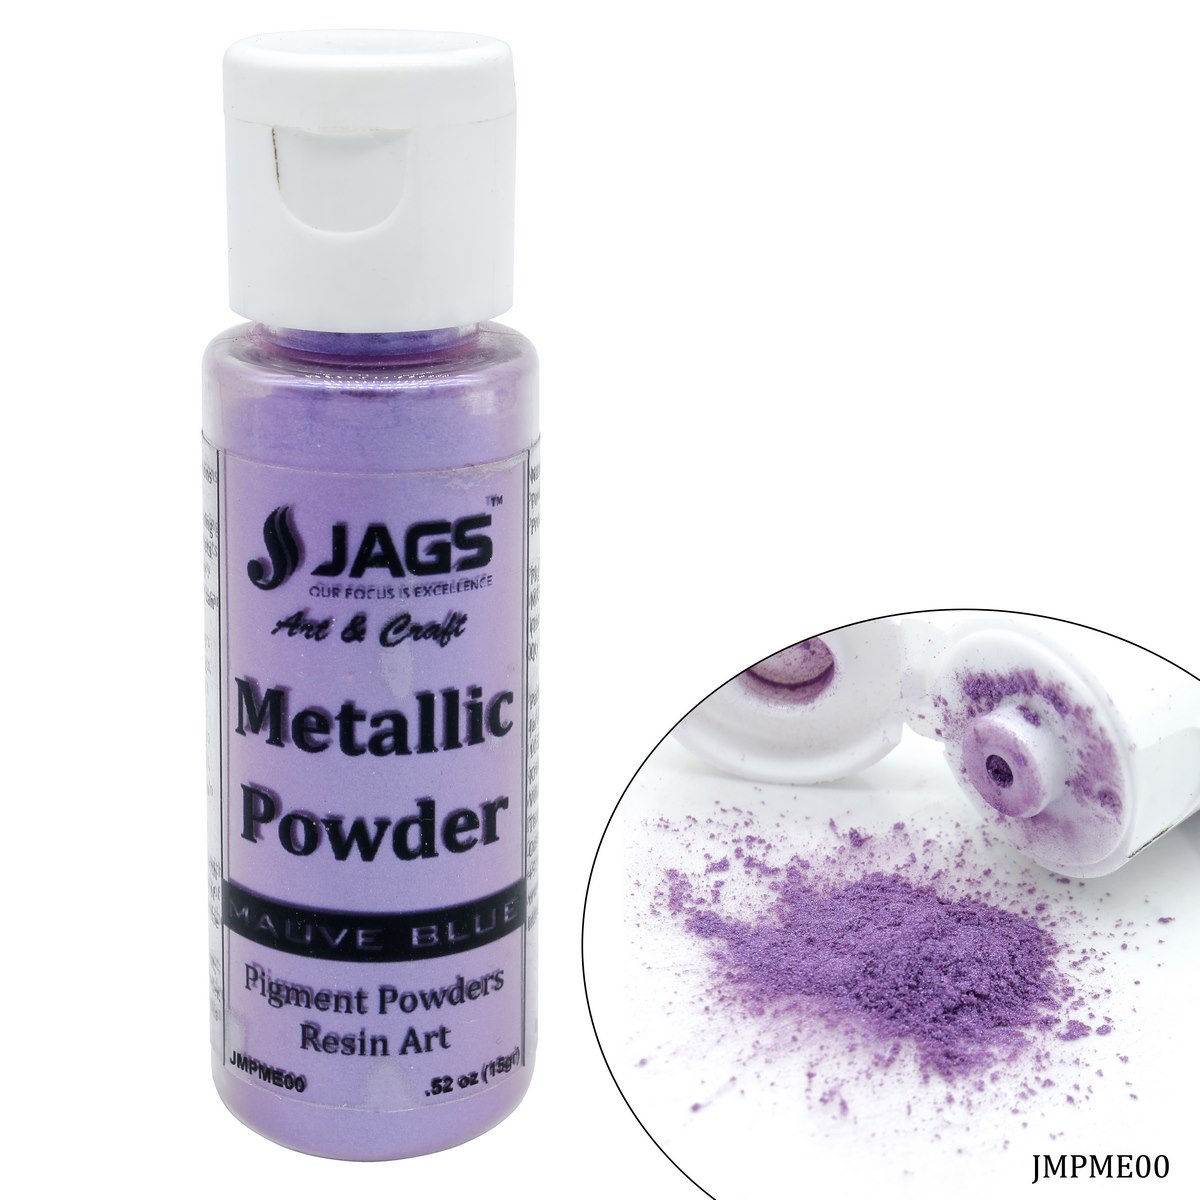 Jags Metallic Powder Mauve Blue 15Gms JMPME00